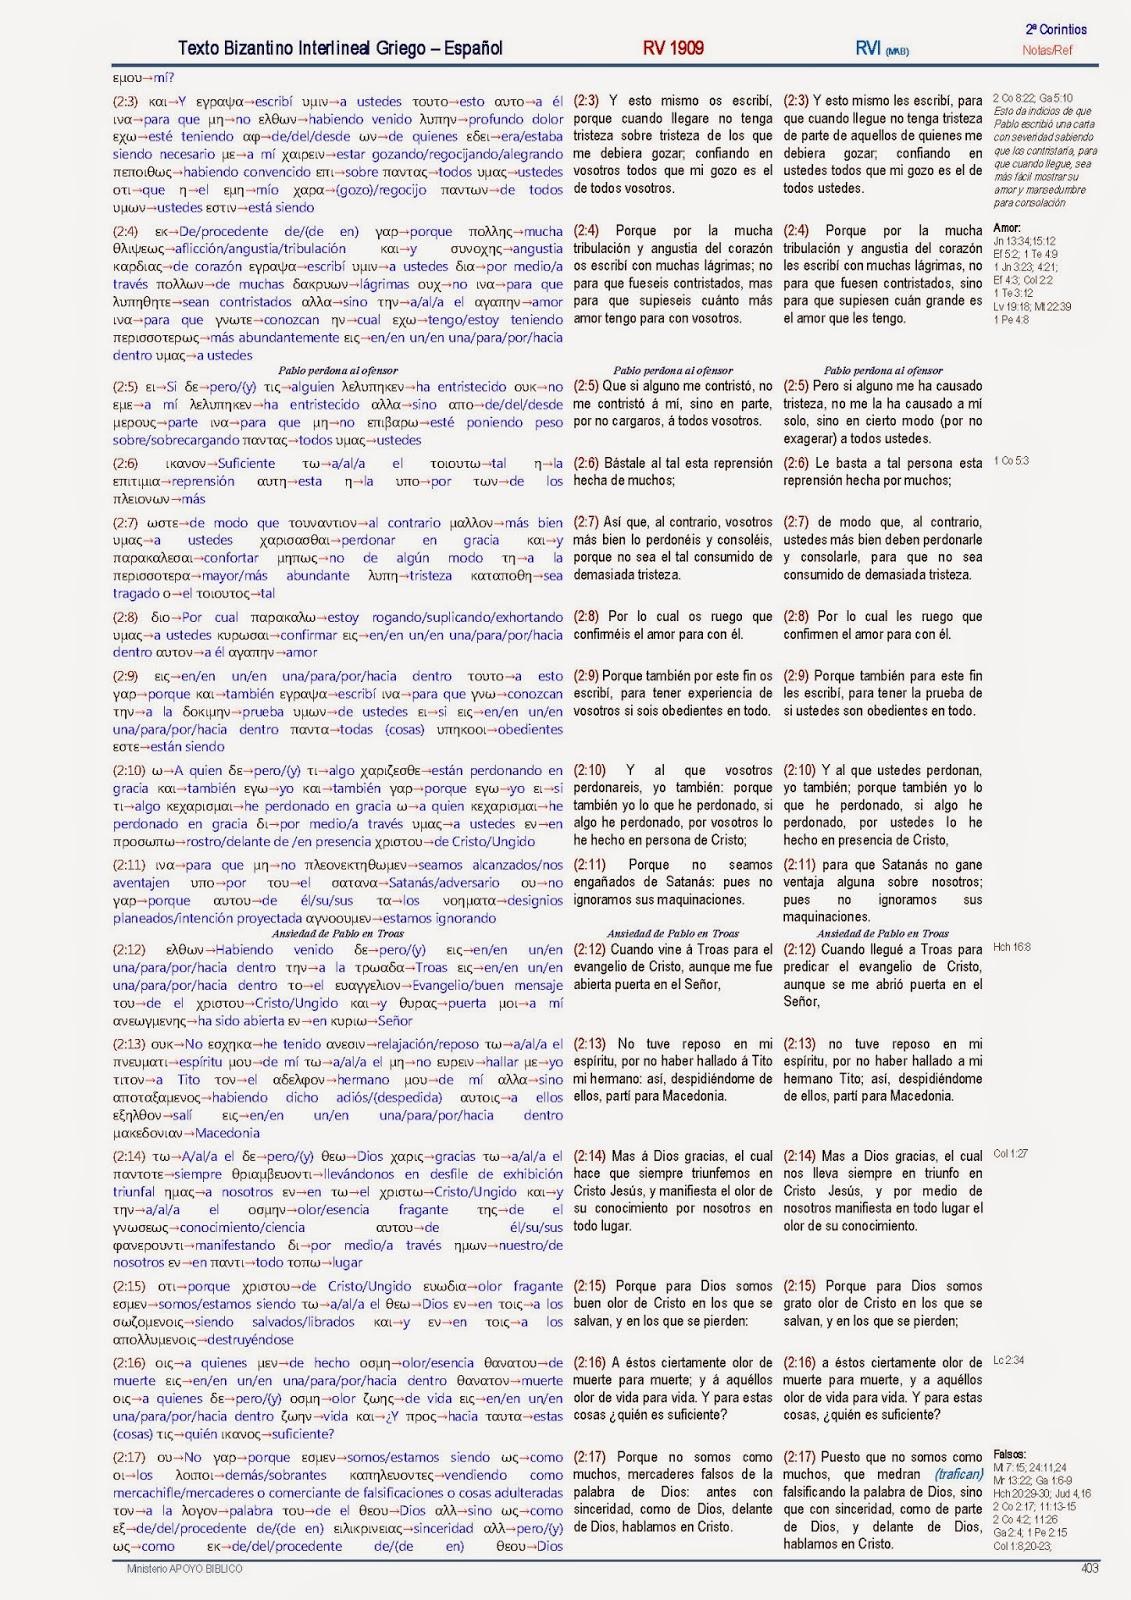 Blog Archives - revizionmortgage